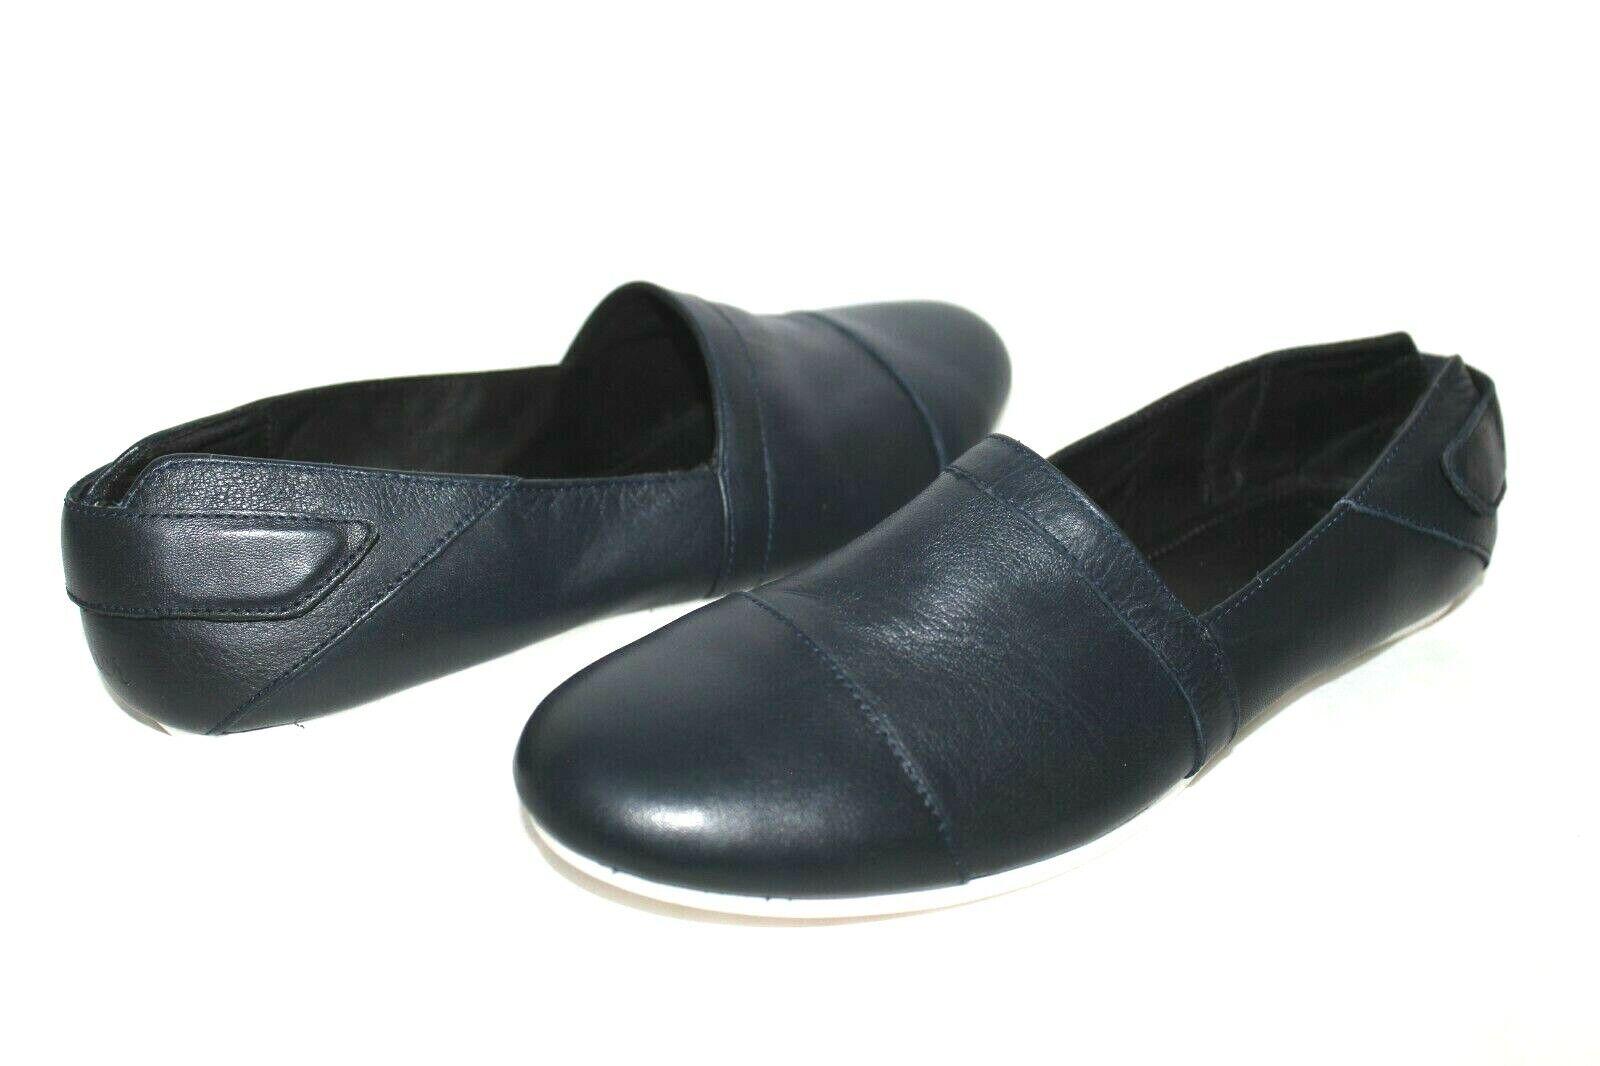 ❤️Penner Chaussures Marine Cuir Premium Confort Plats 6 6.5 36 Excellent ! LOOK